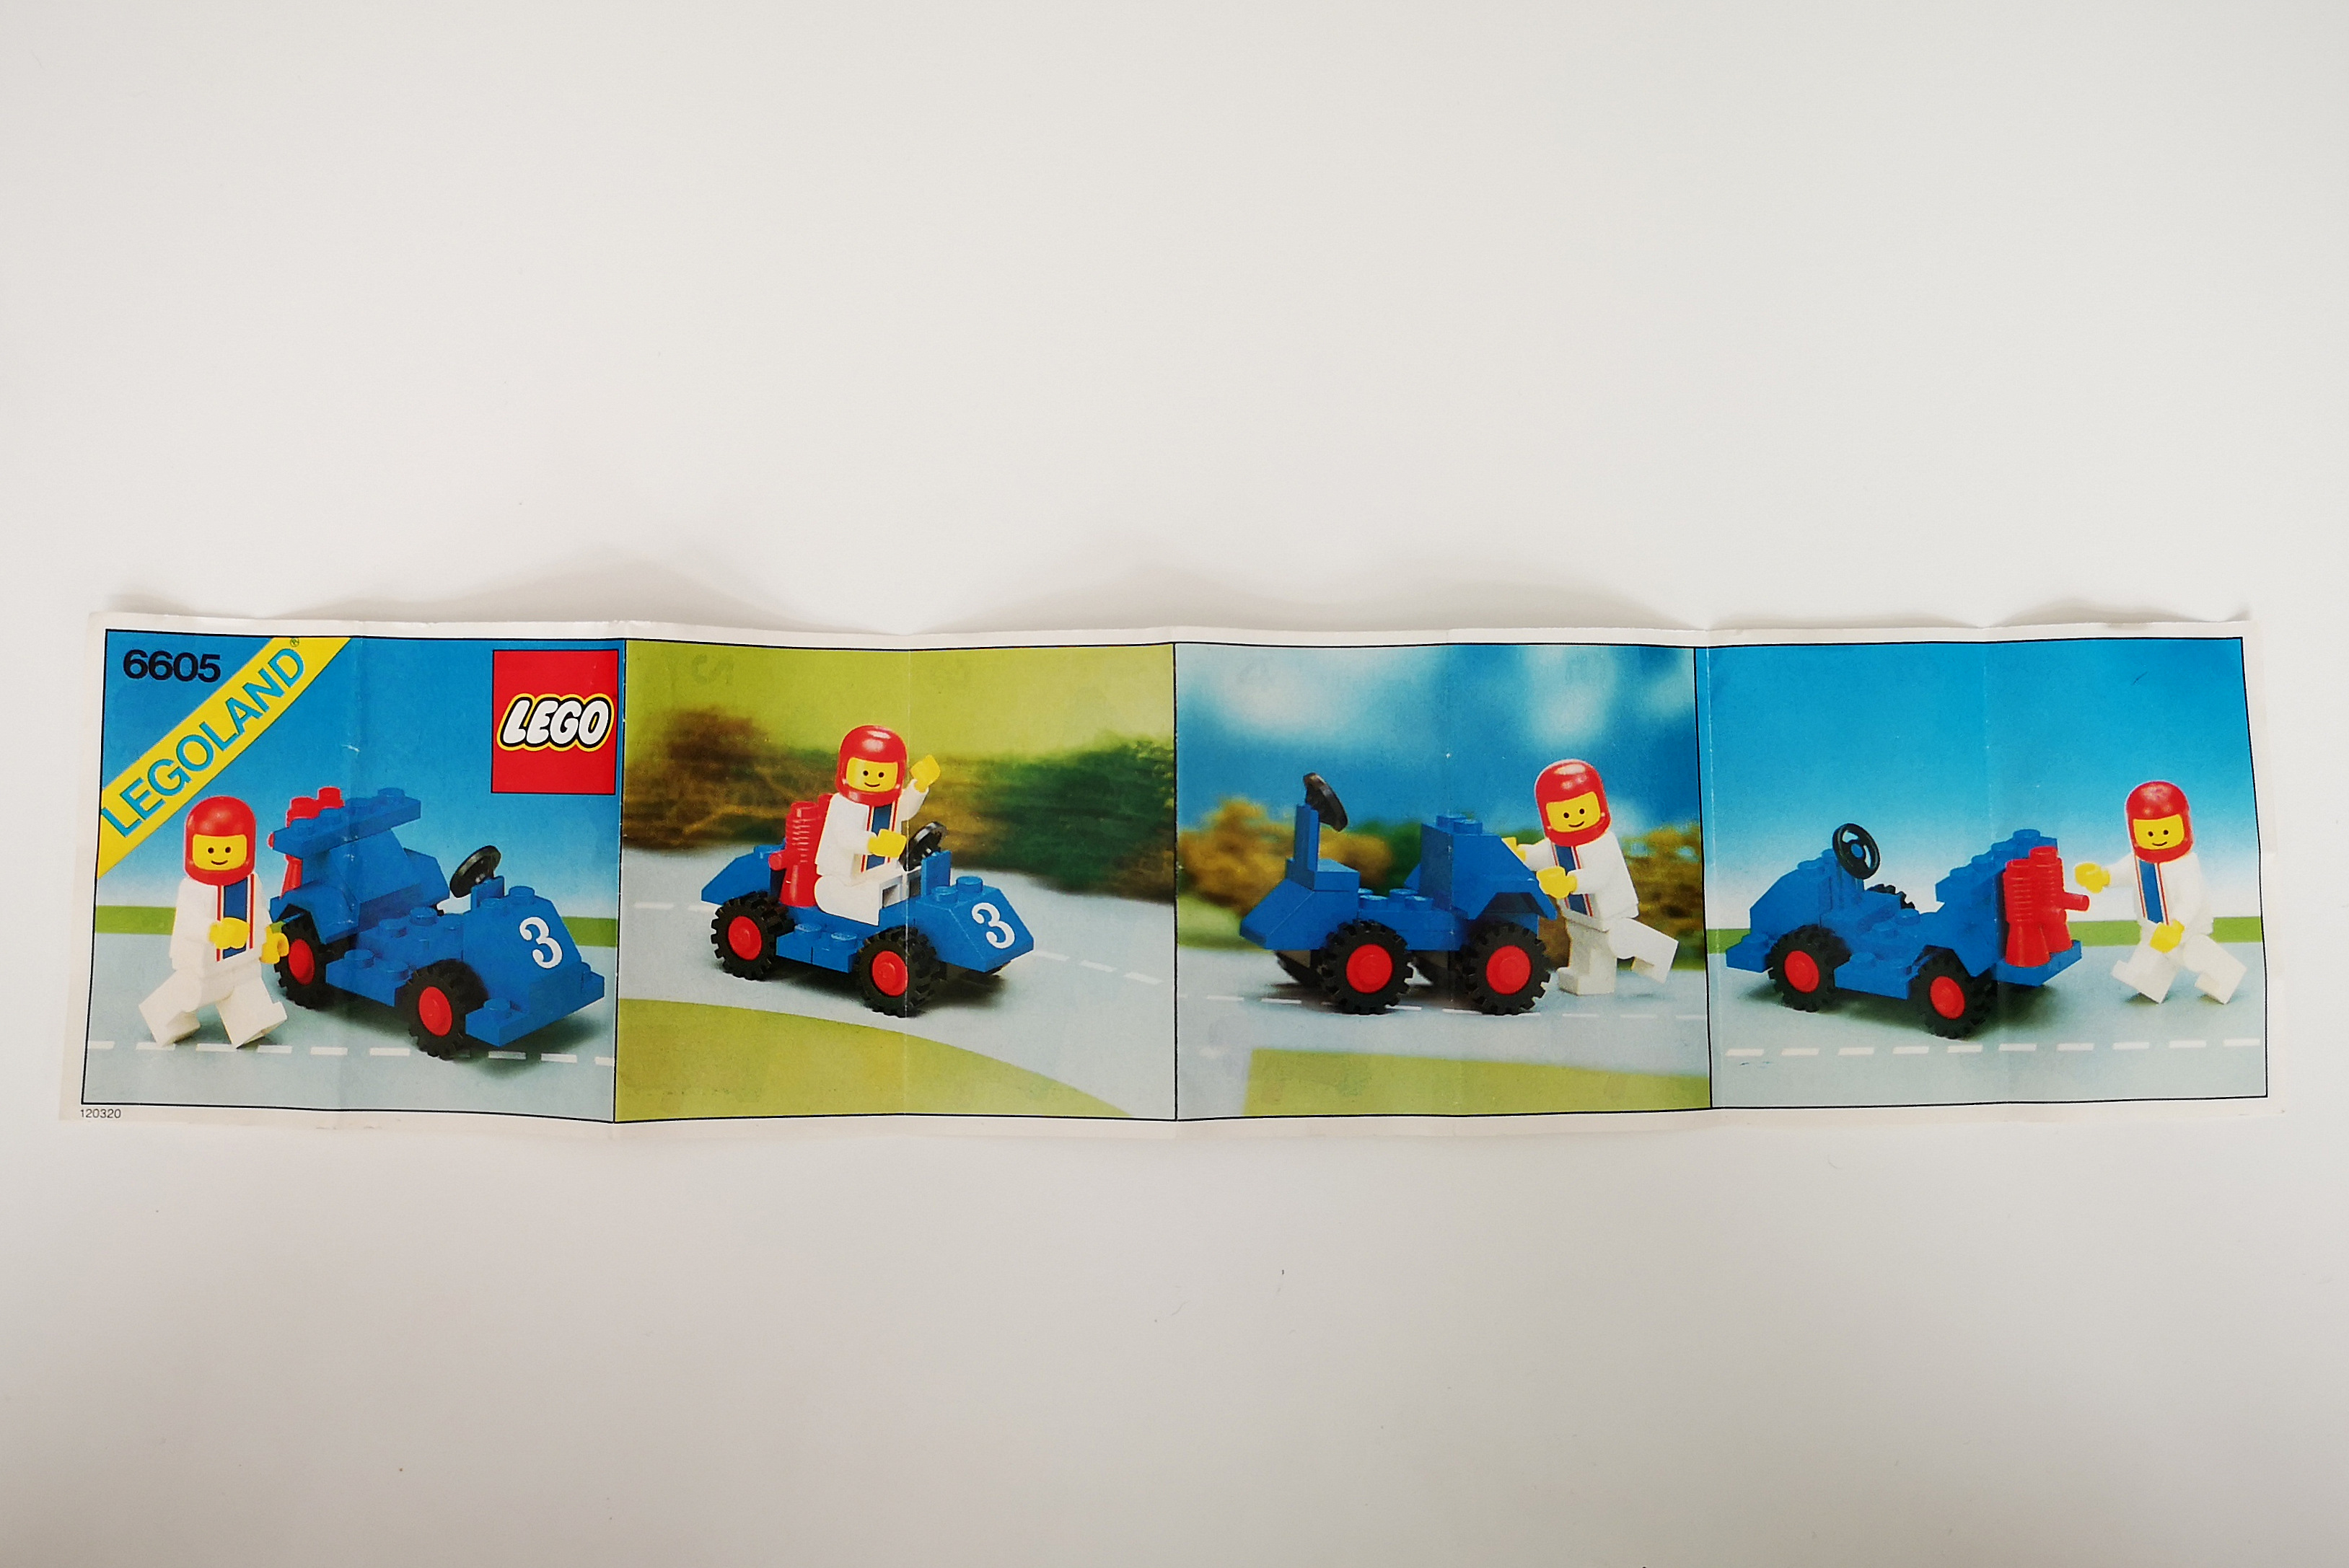 LEGO Review 6605 Anleitung